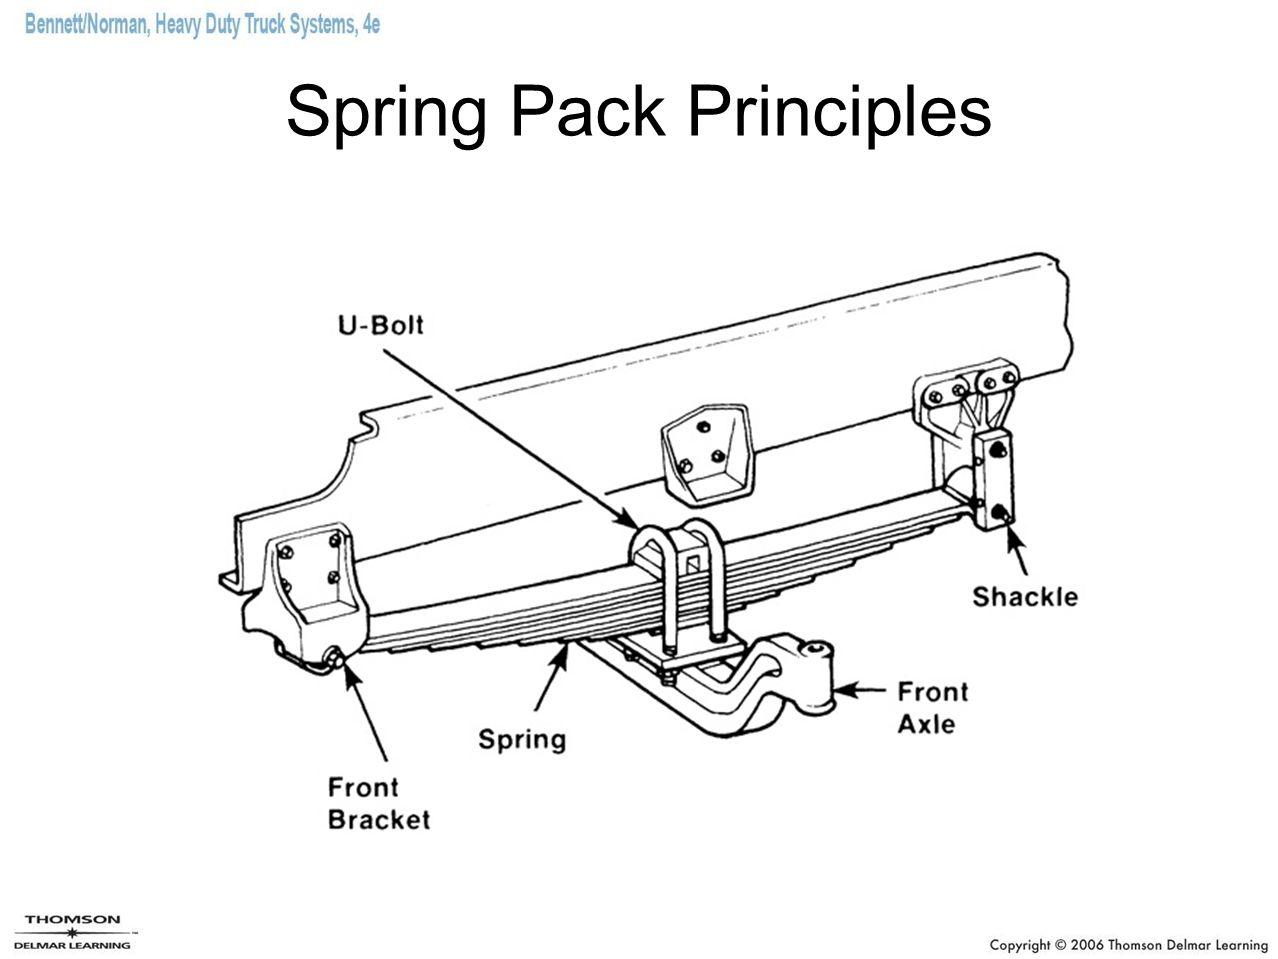 Spring Pack Principles